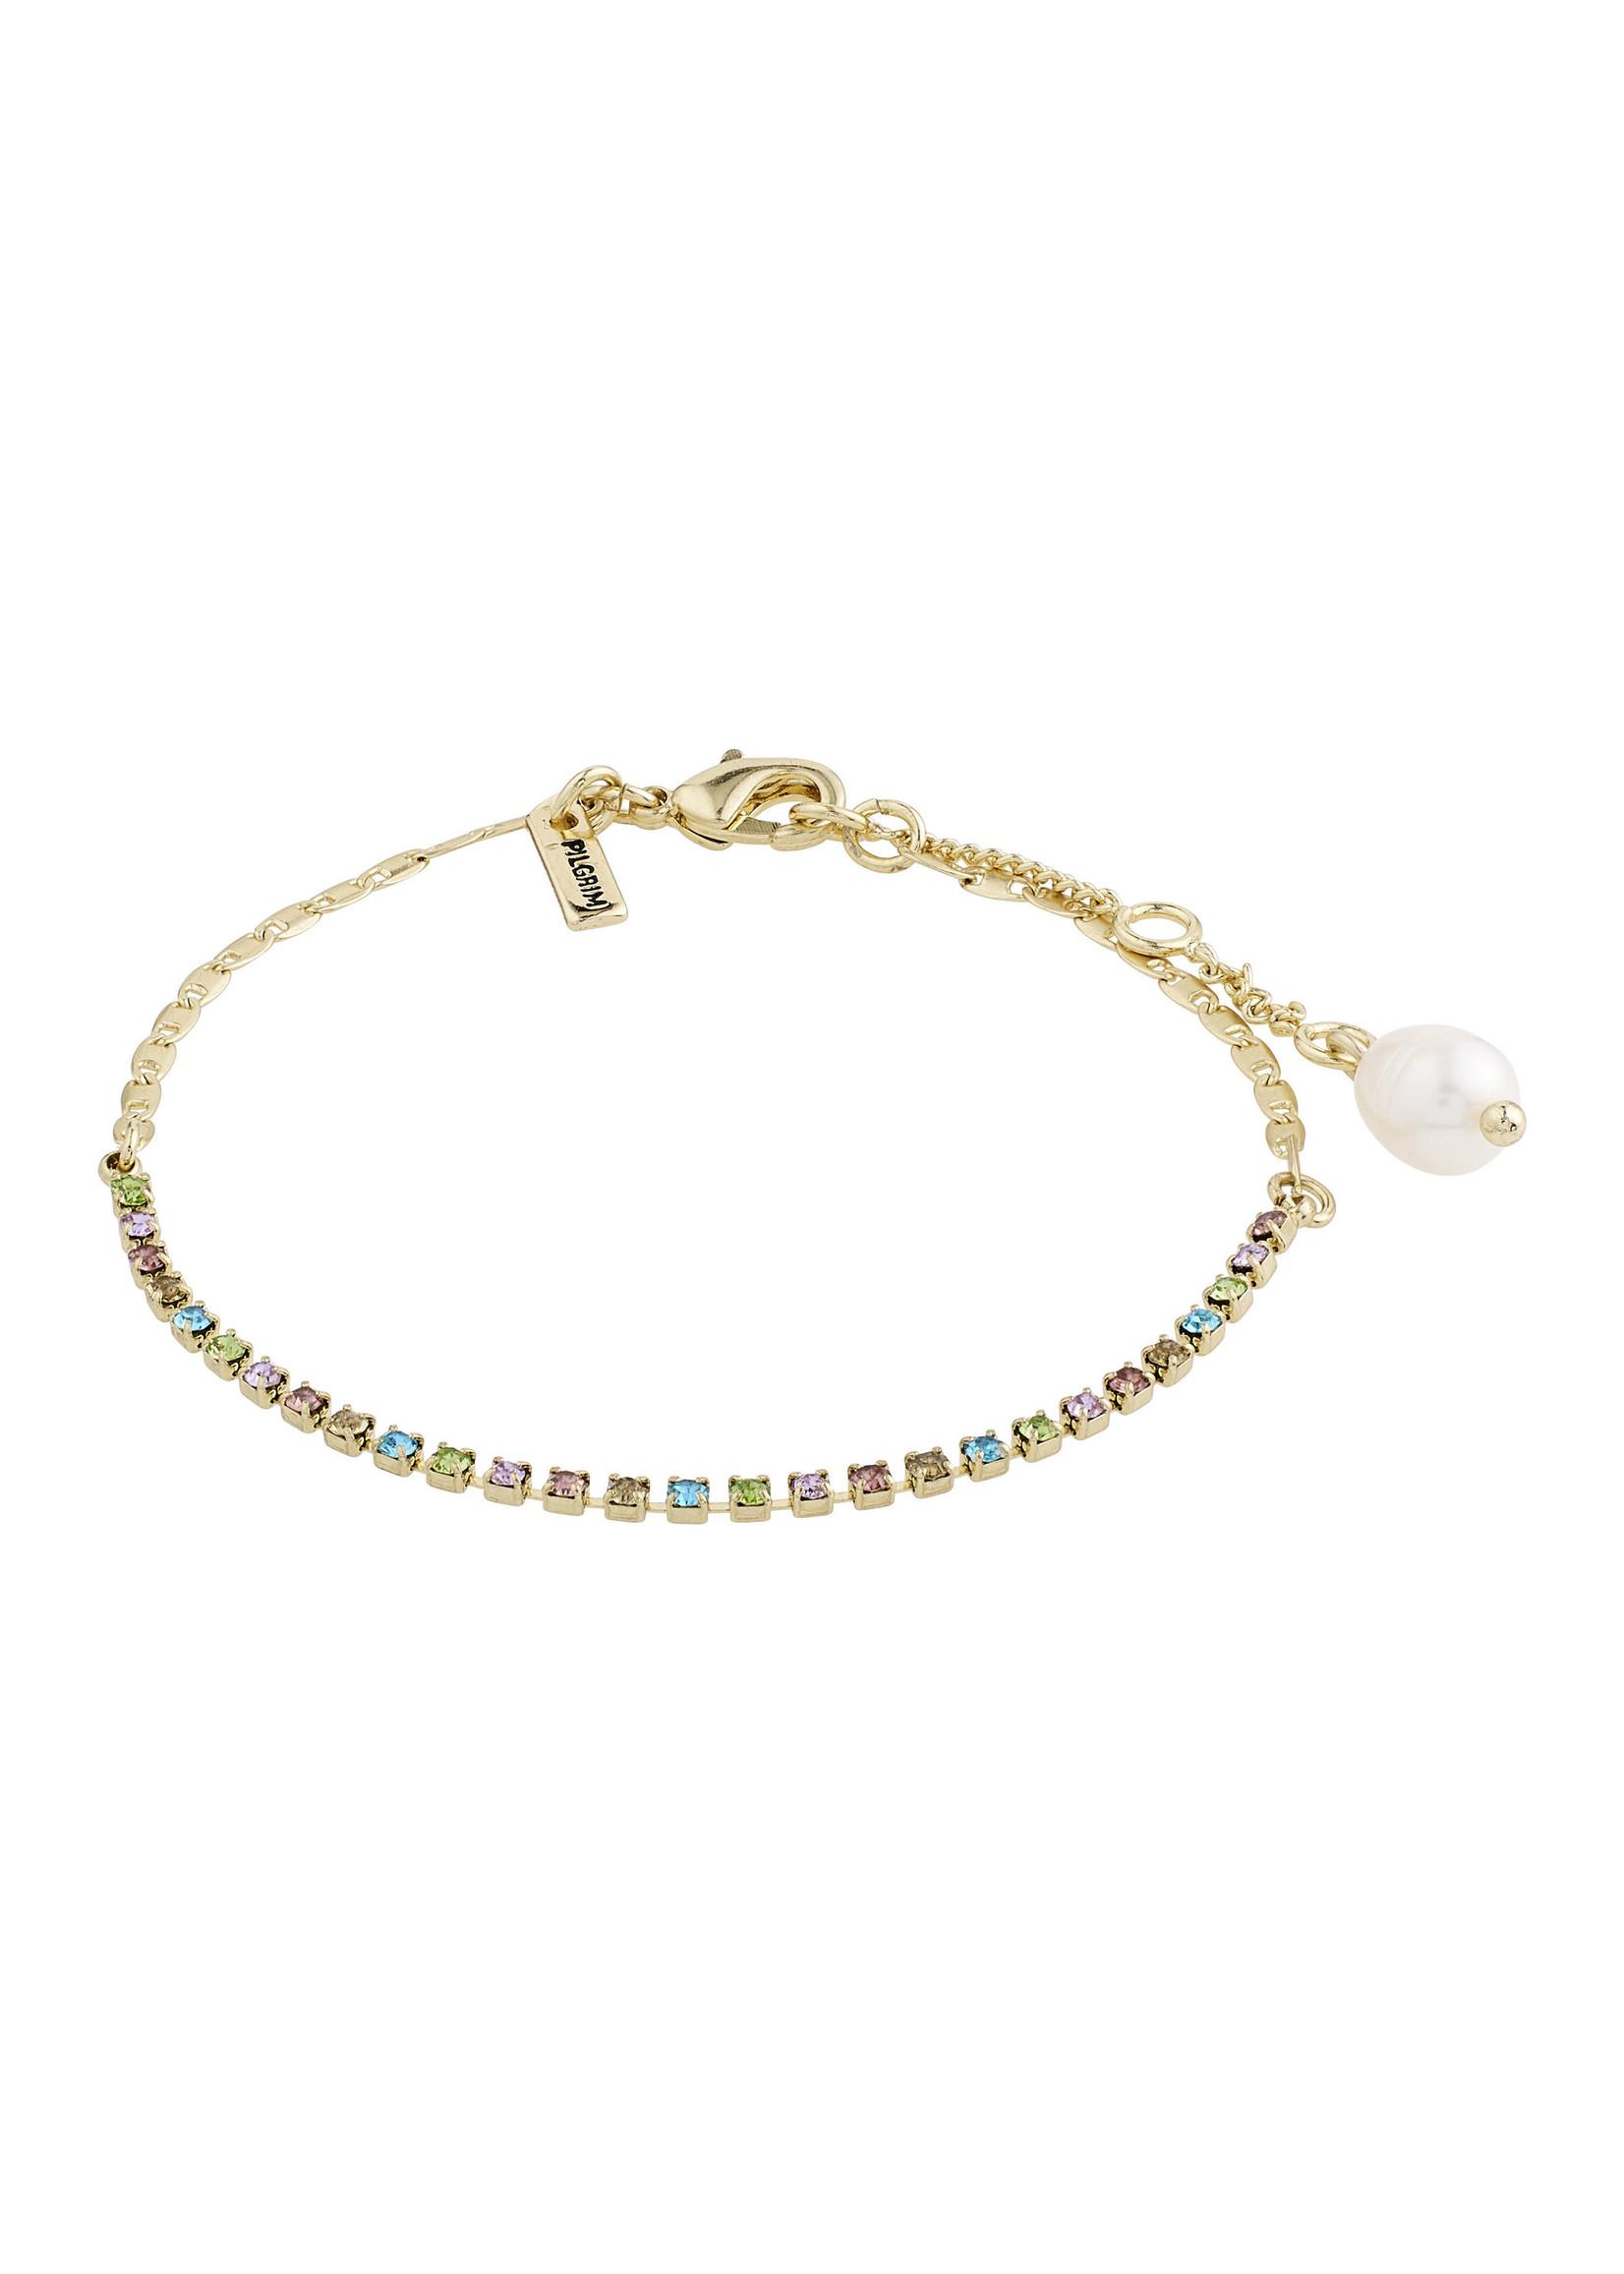 Pilgrim Jewellery Cherished Bracelet - Gold